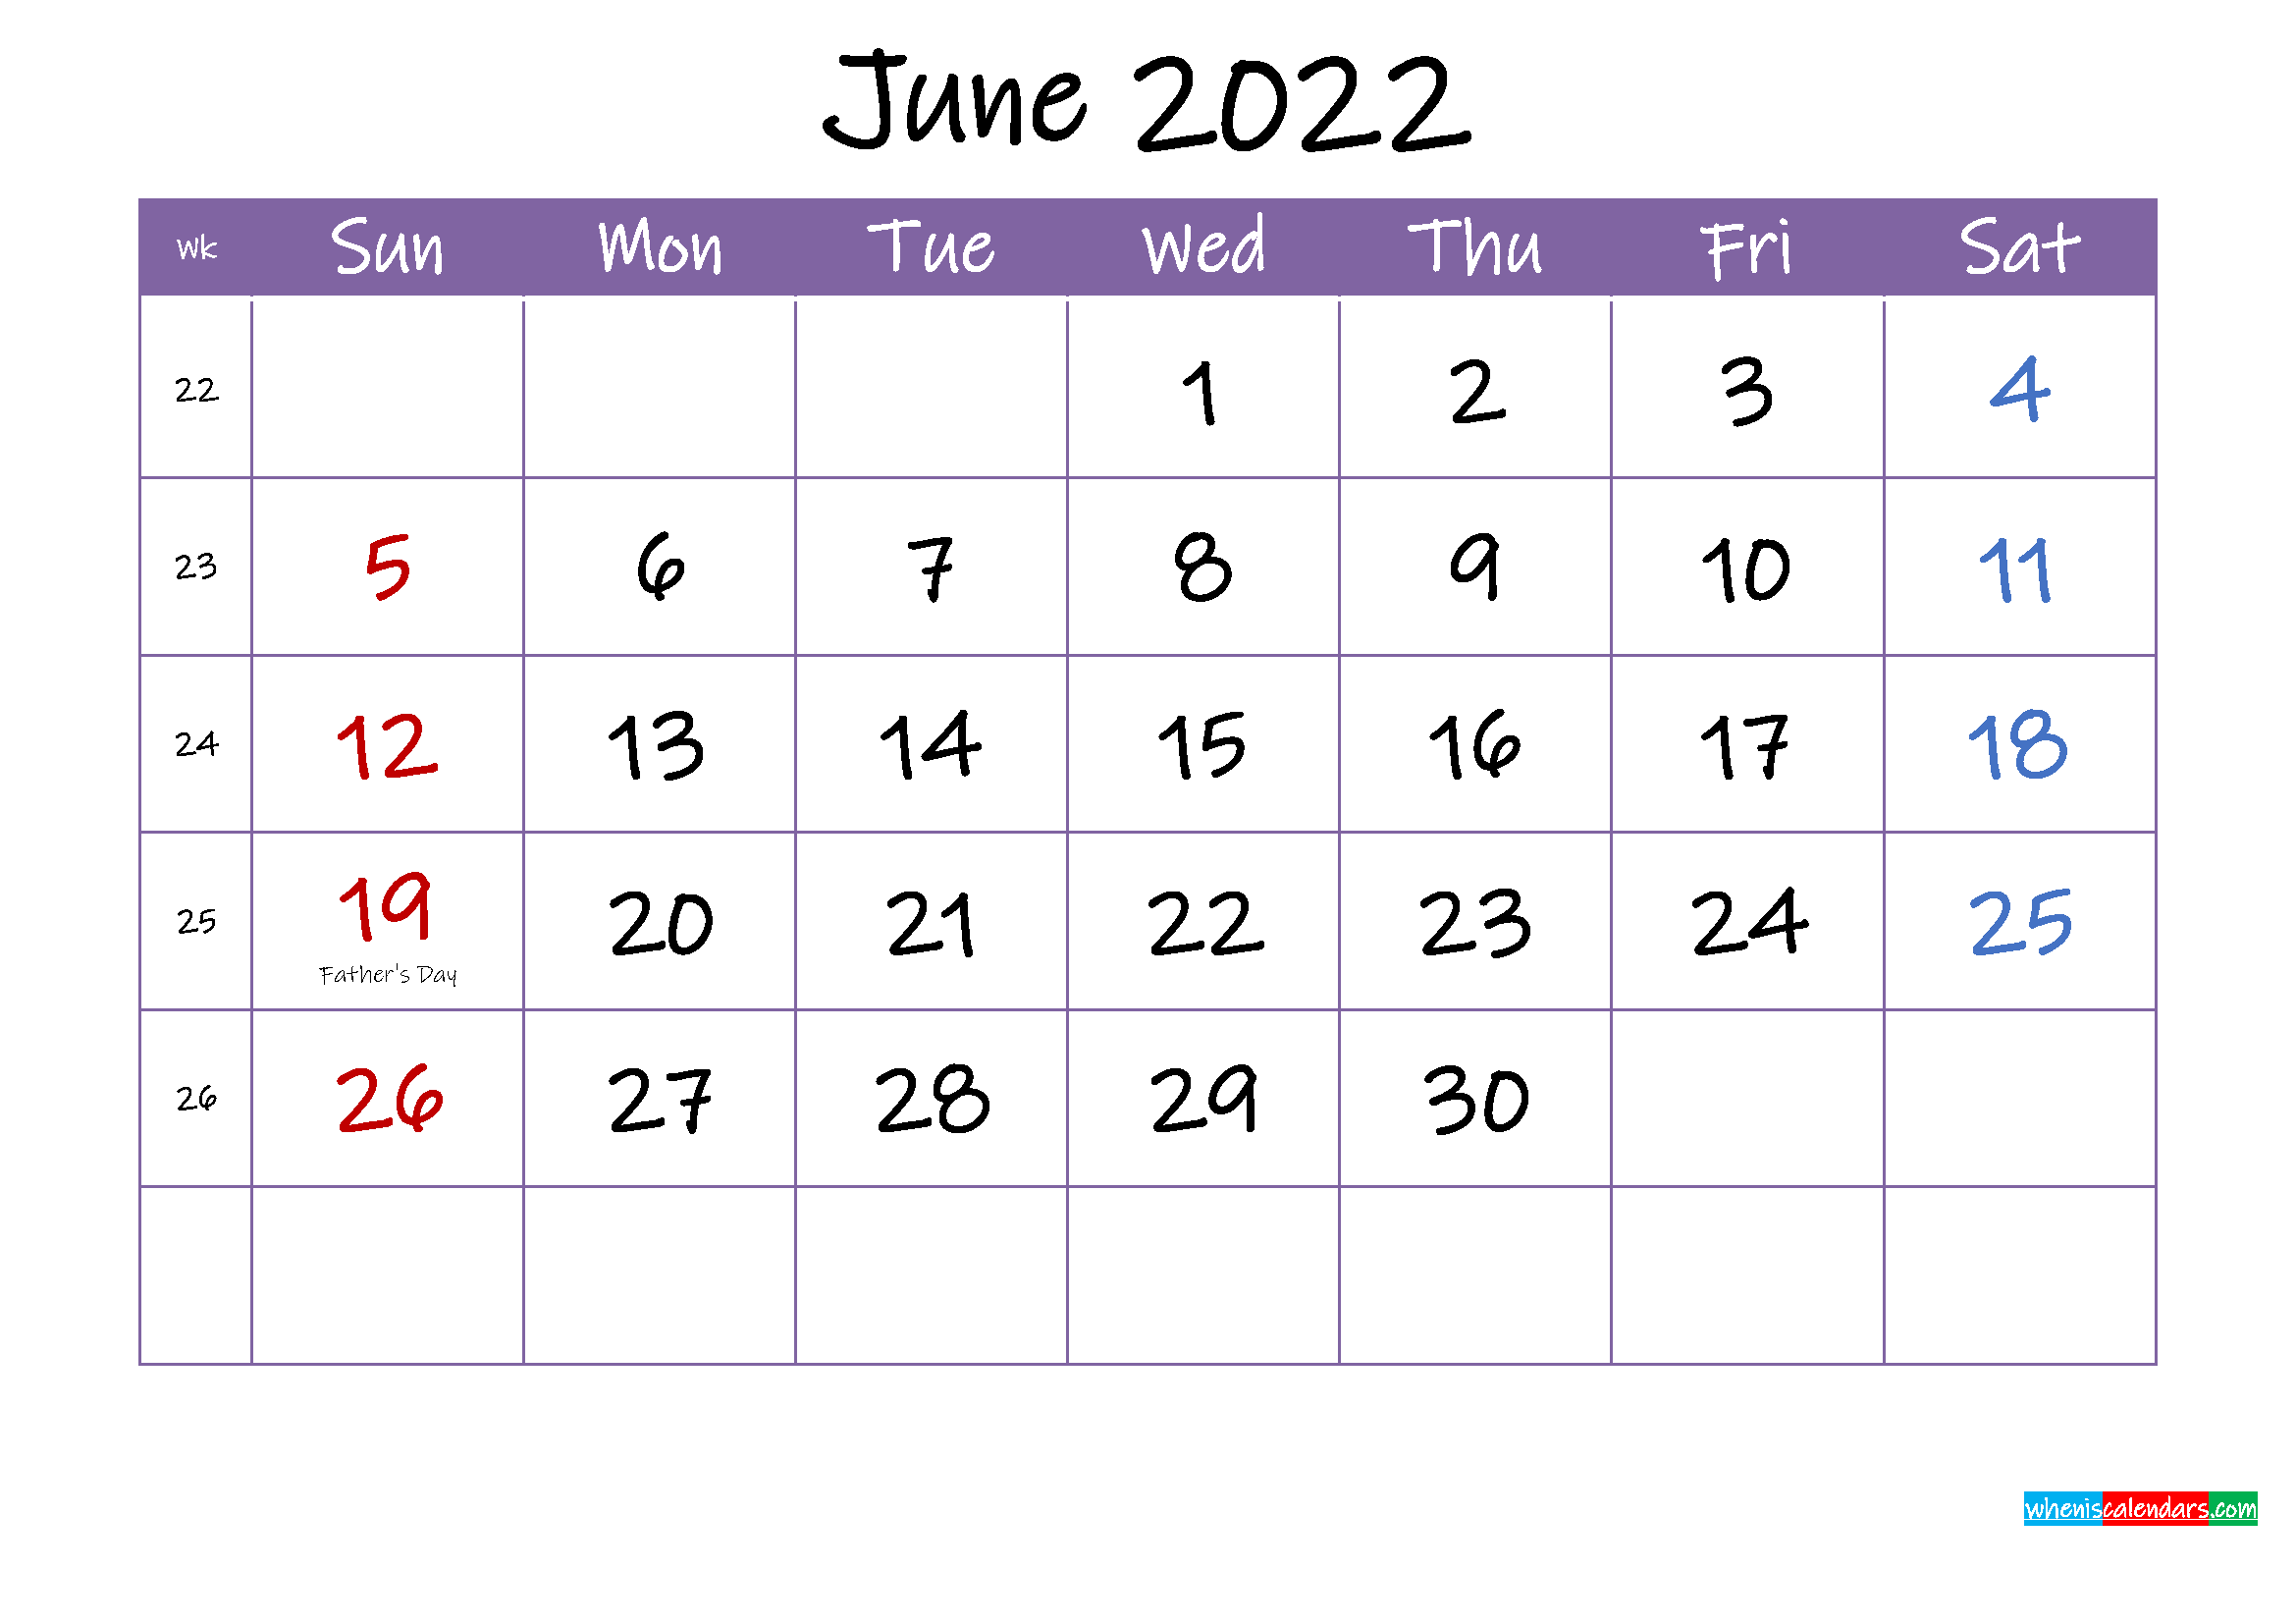 June 2022 Calendar with Holidays Printable